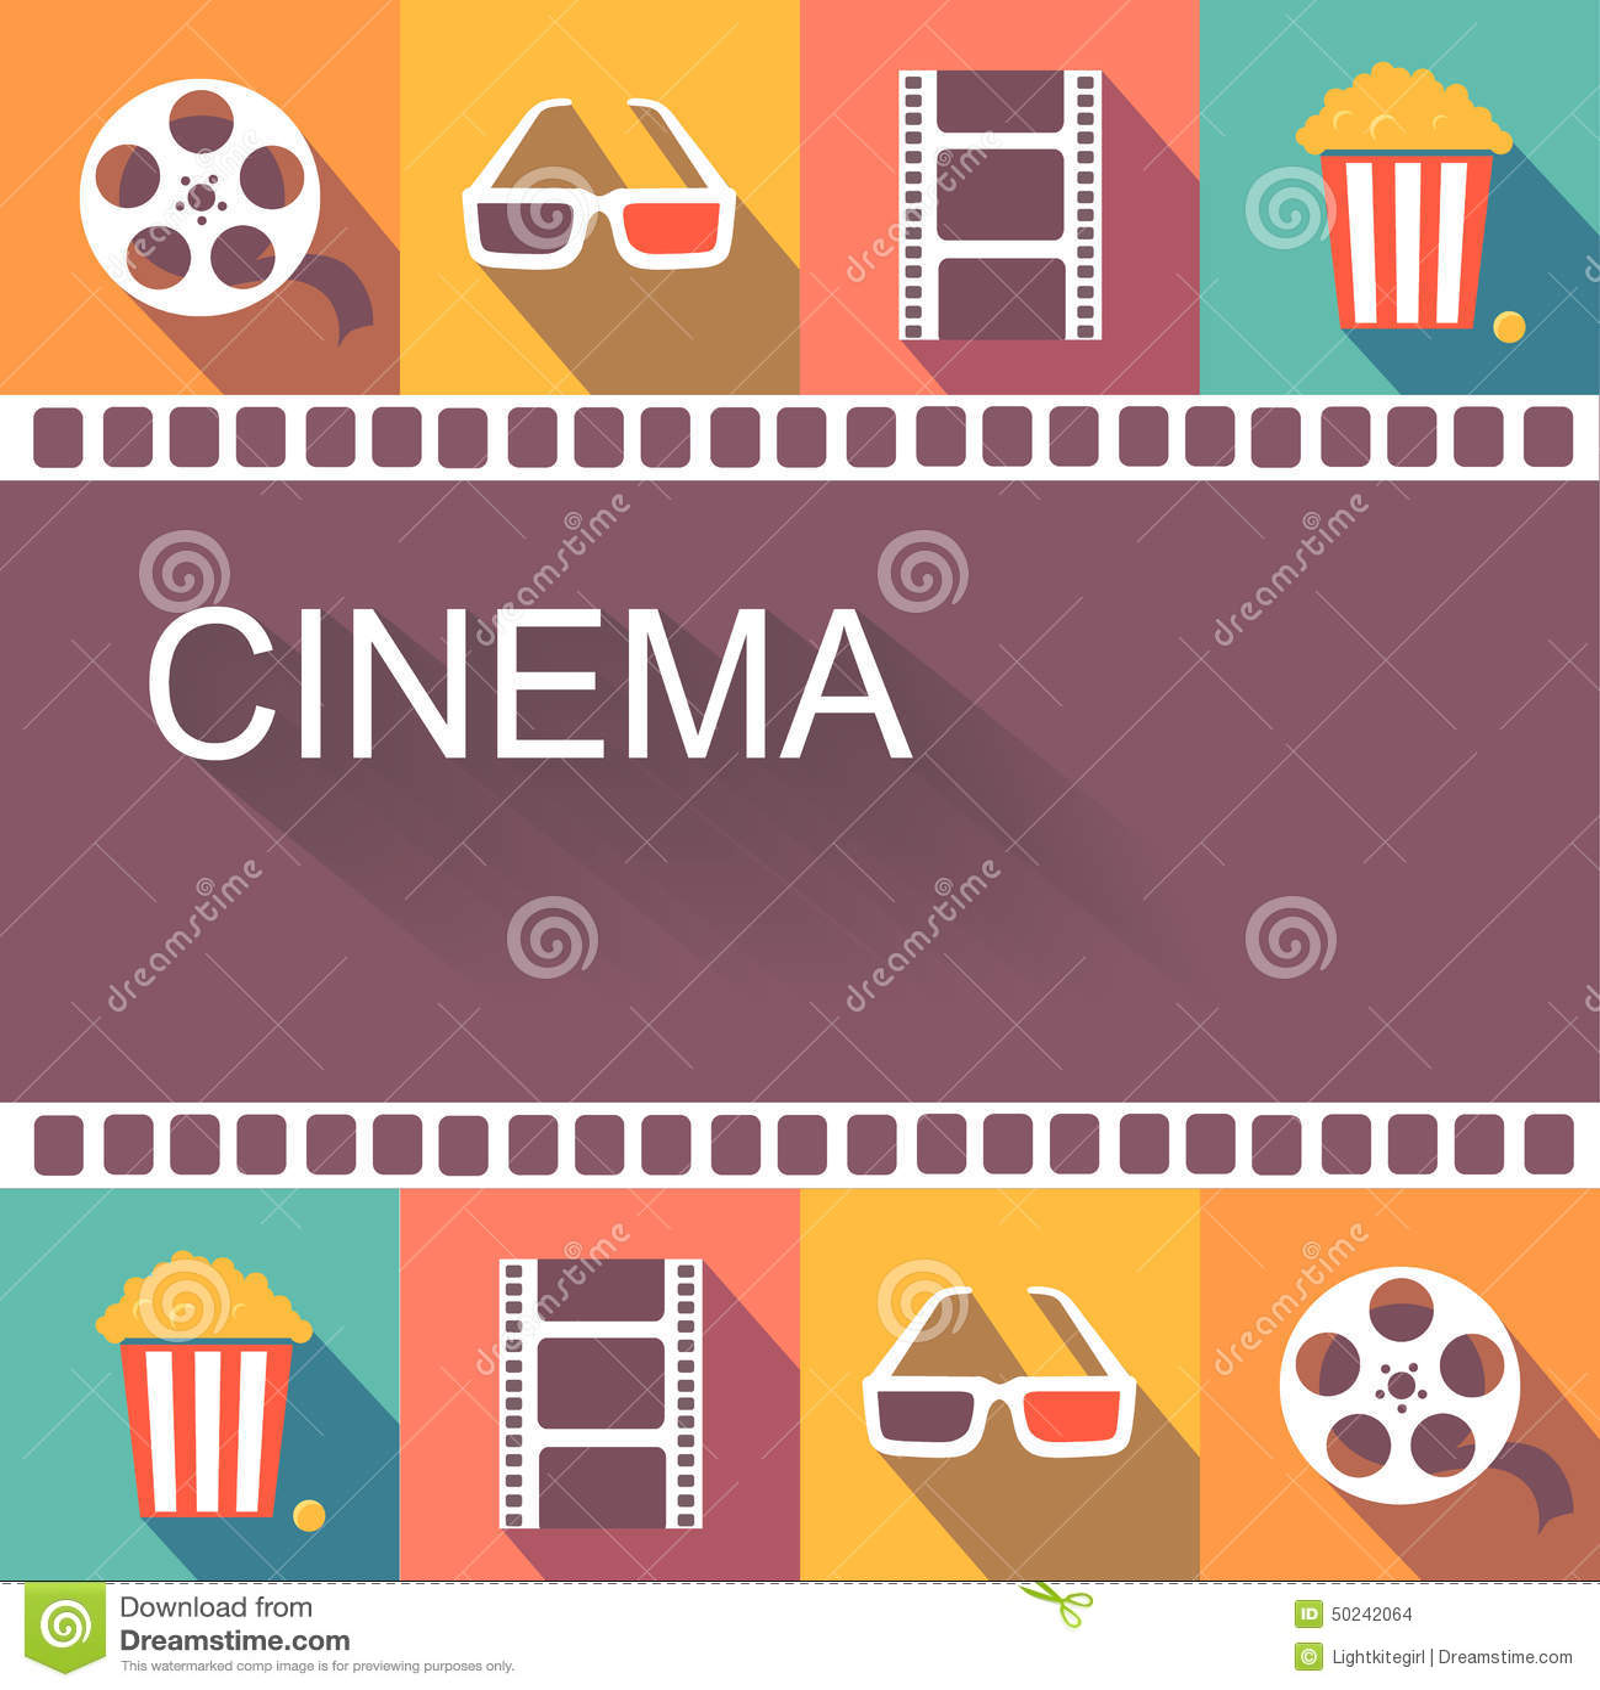 Elements of a poster design - Cinema Design Movie Poster Vector Action Sign Element